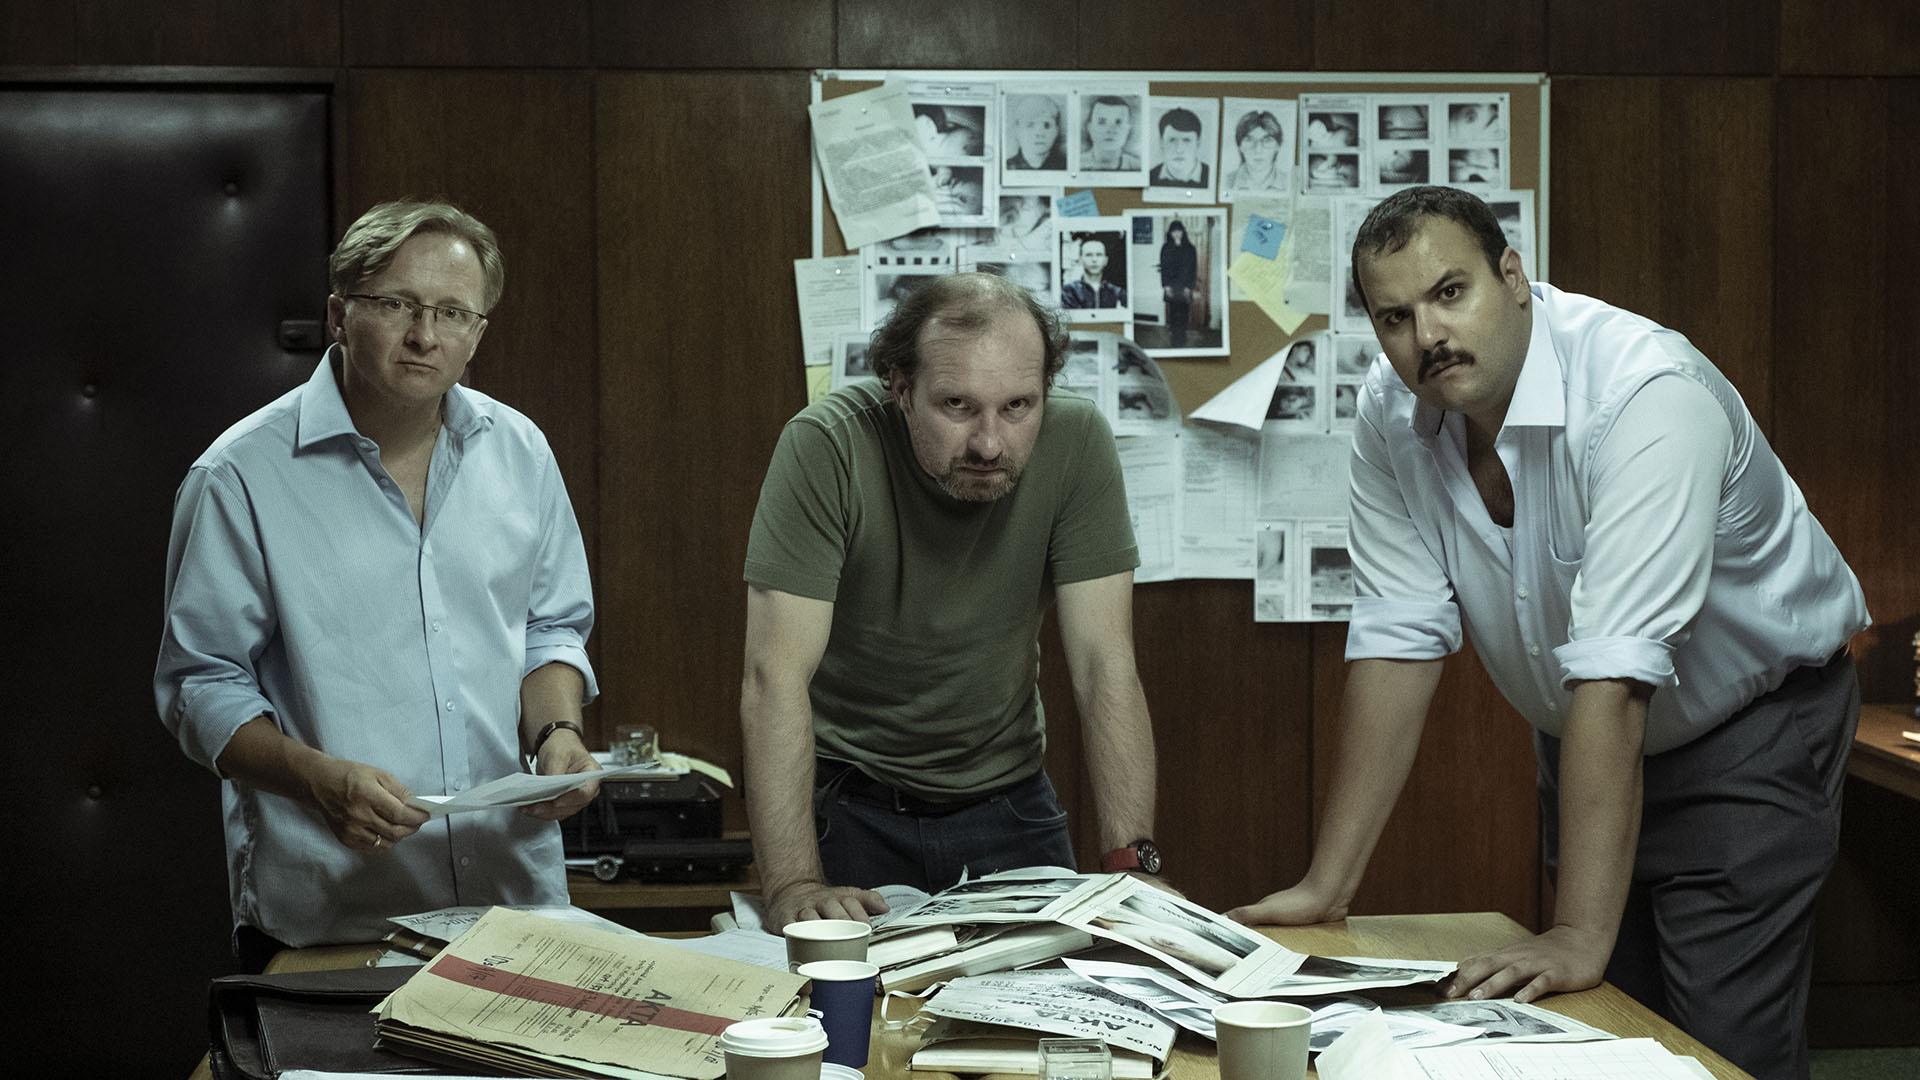 25 Years of Innocence. The Case of Tomek Komenda